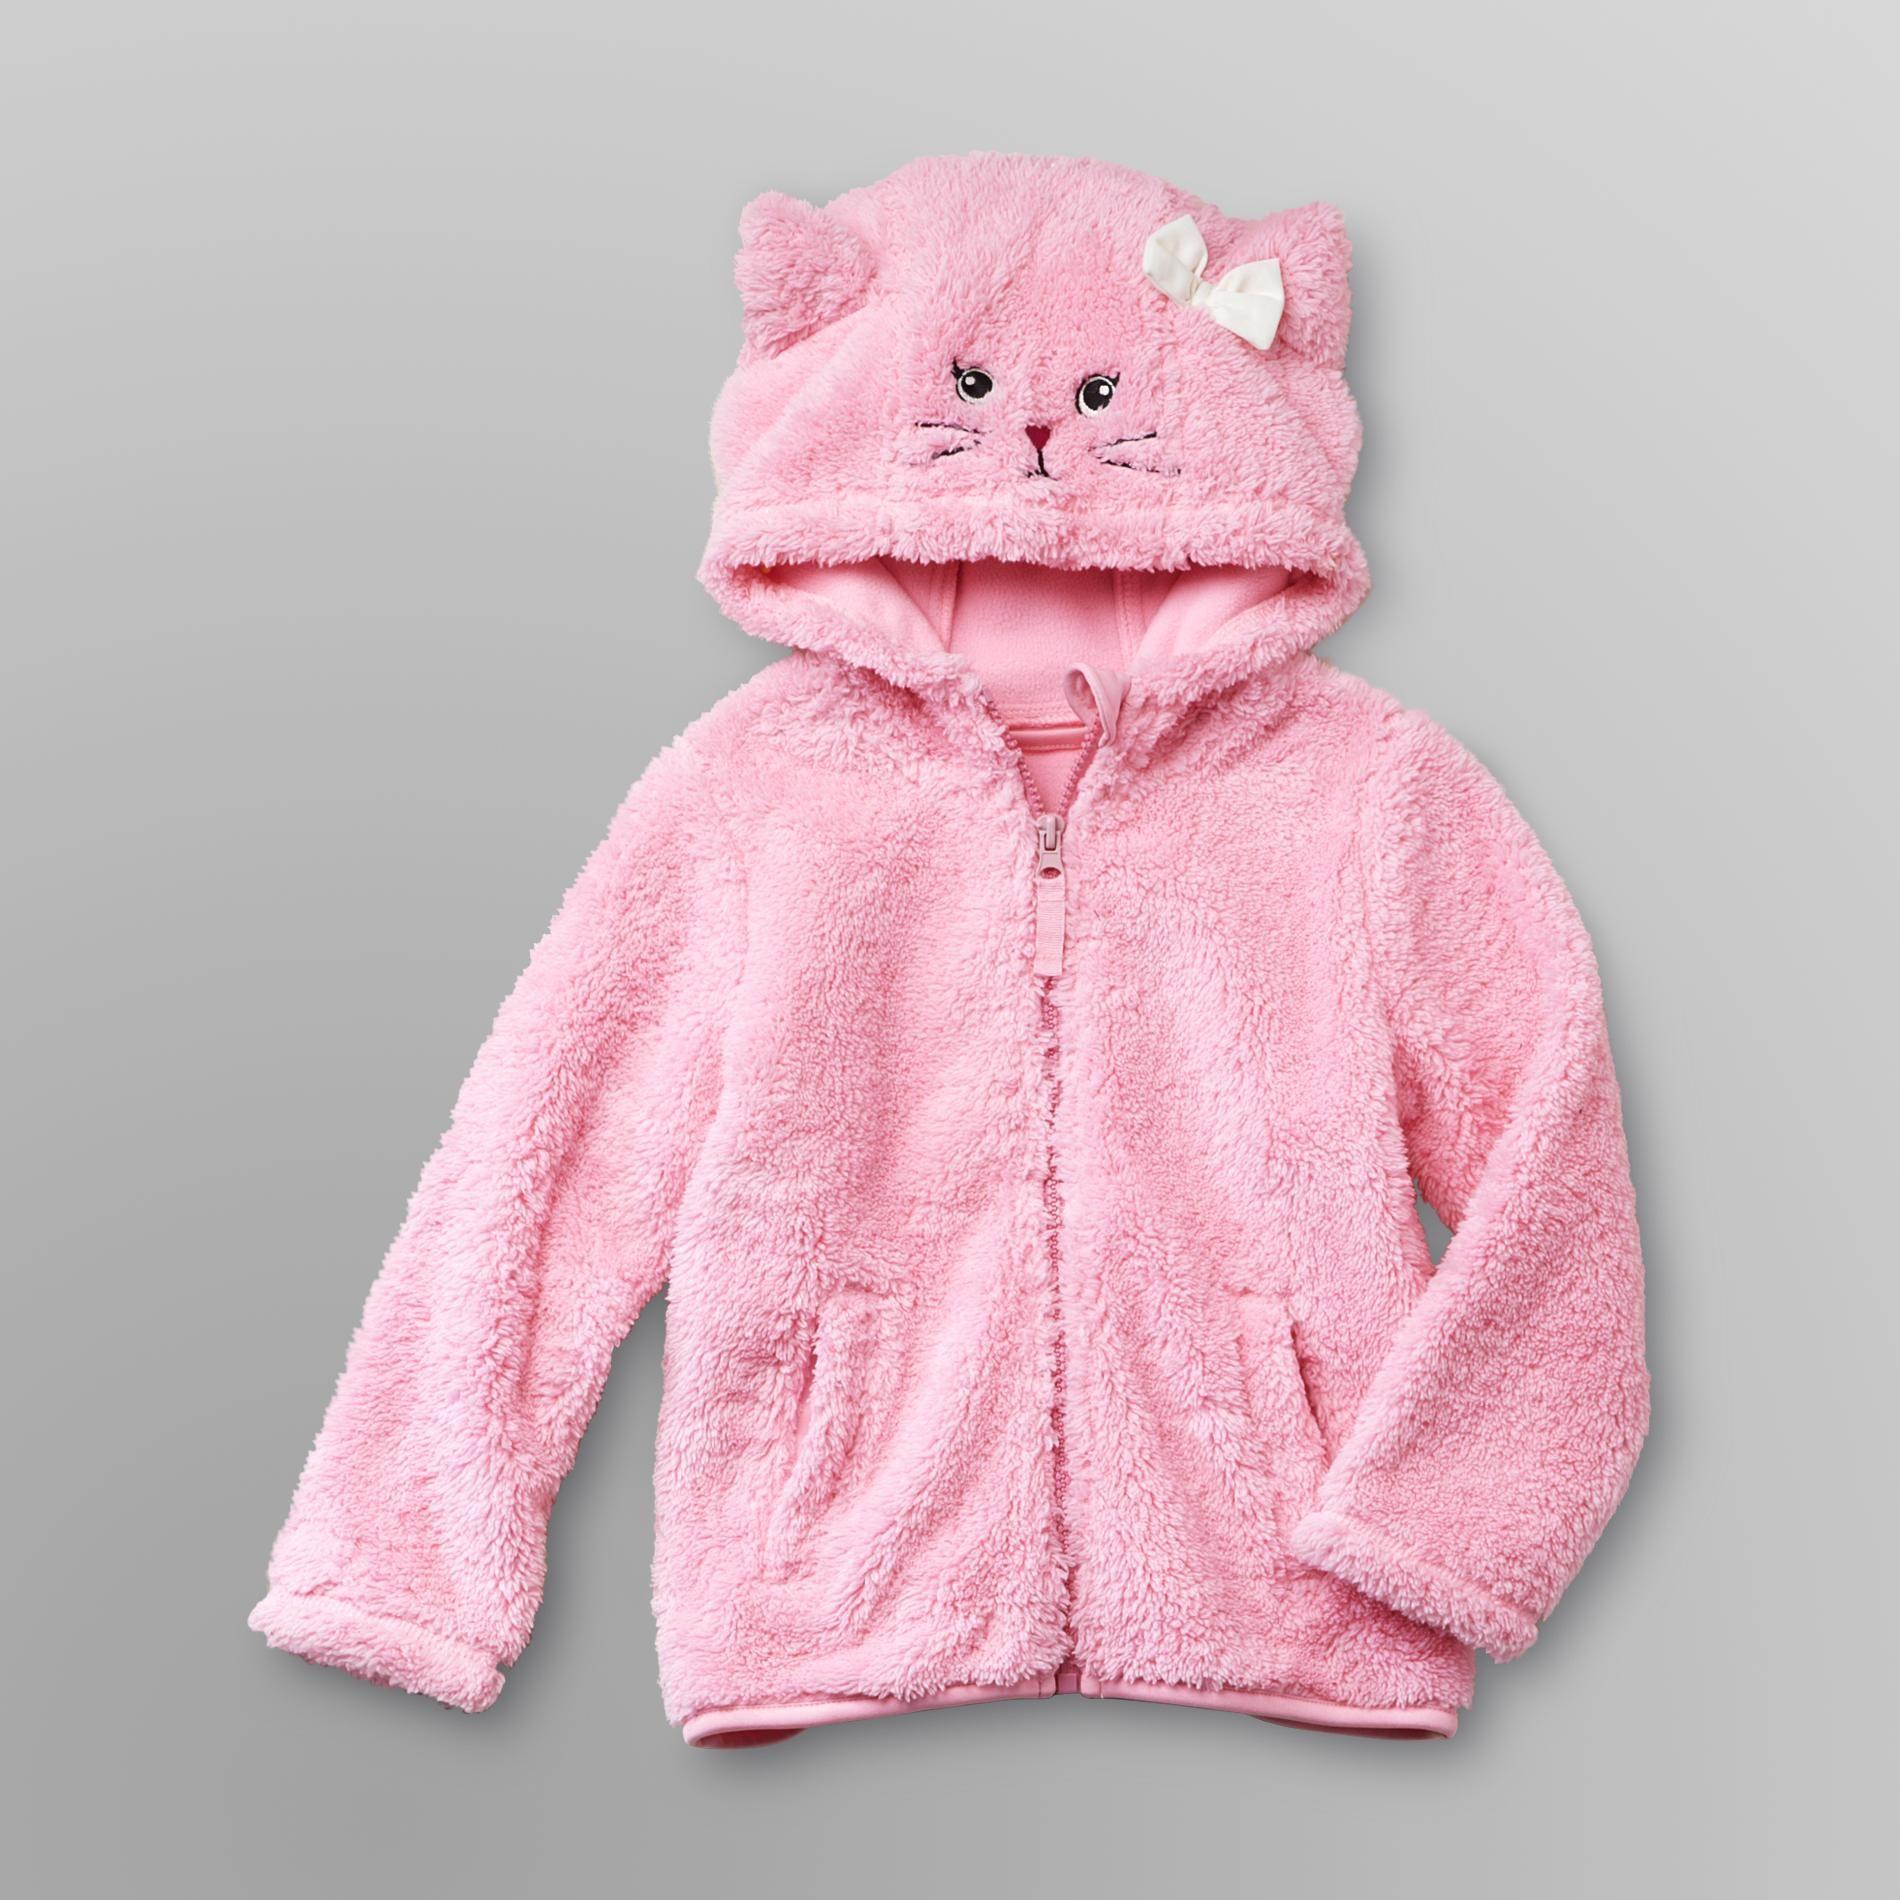 dc750aabca080 WonderKids Infant & Toddler Girl's Plush Fleece Jacket - Kitty Cat ...